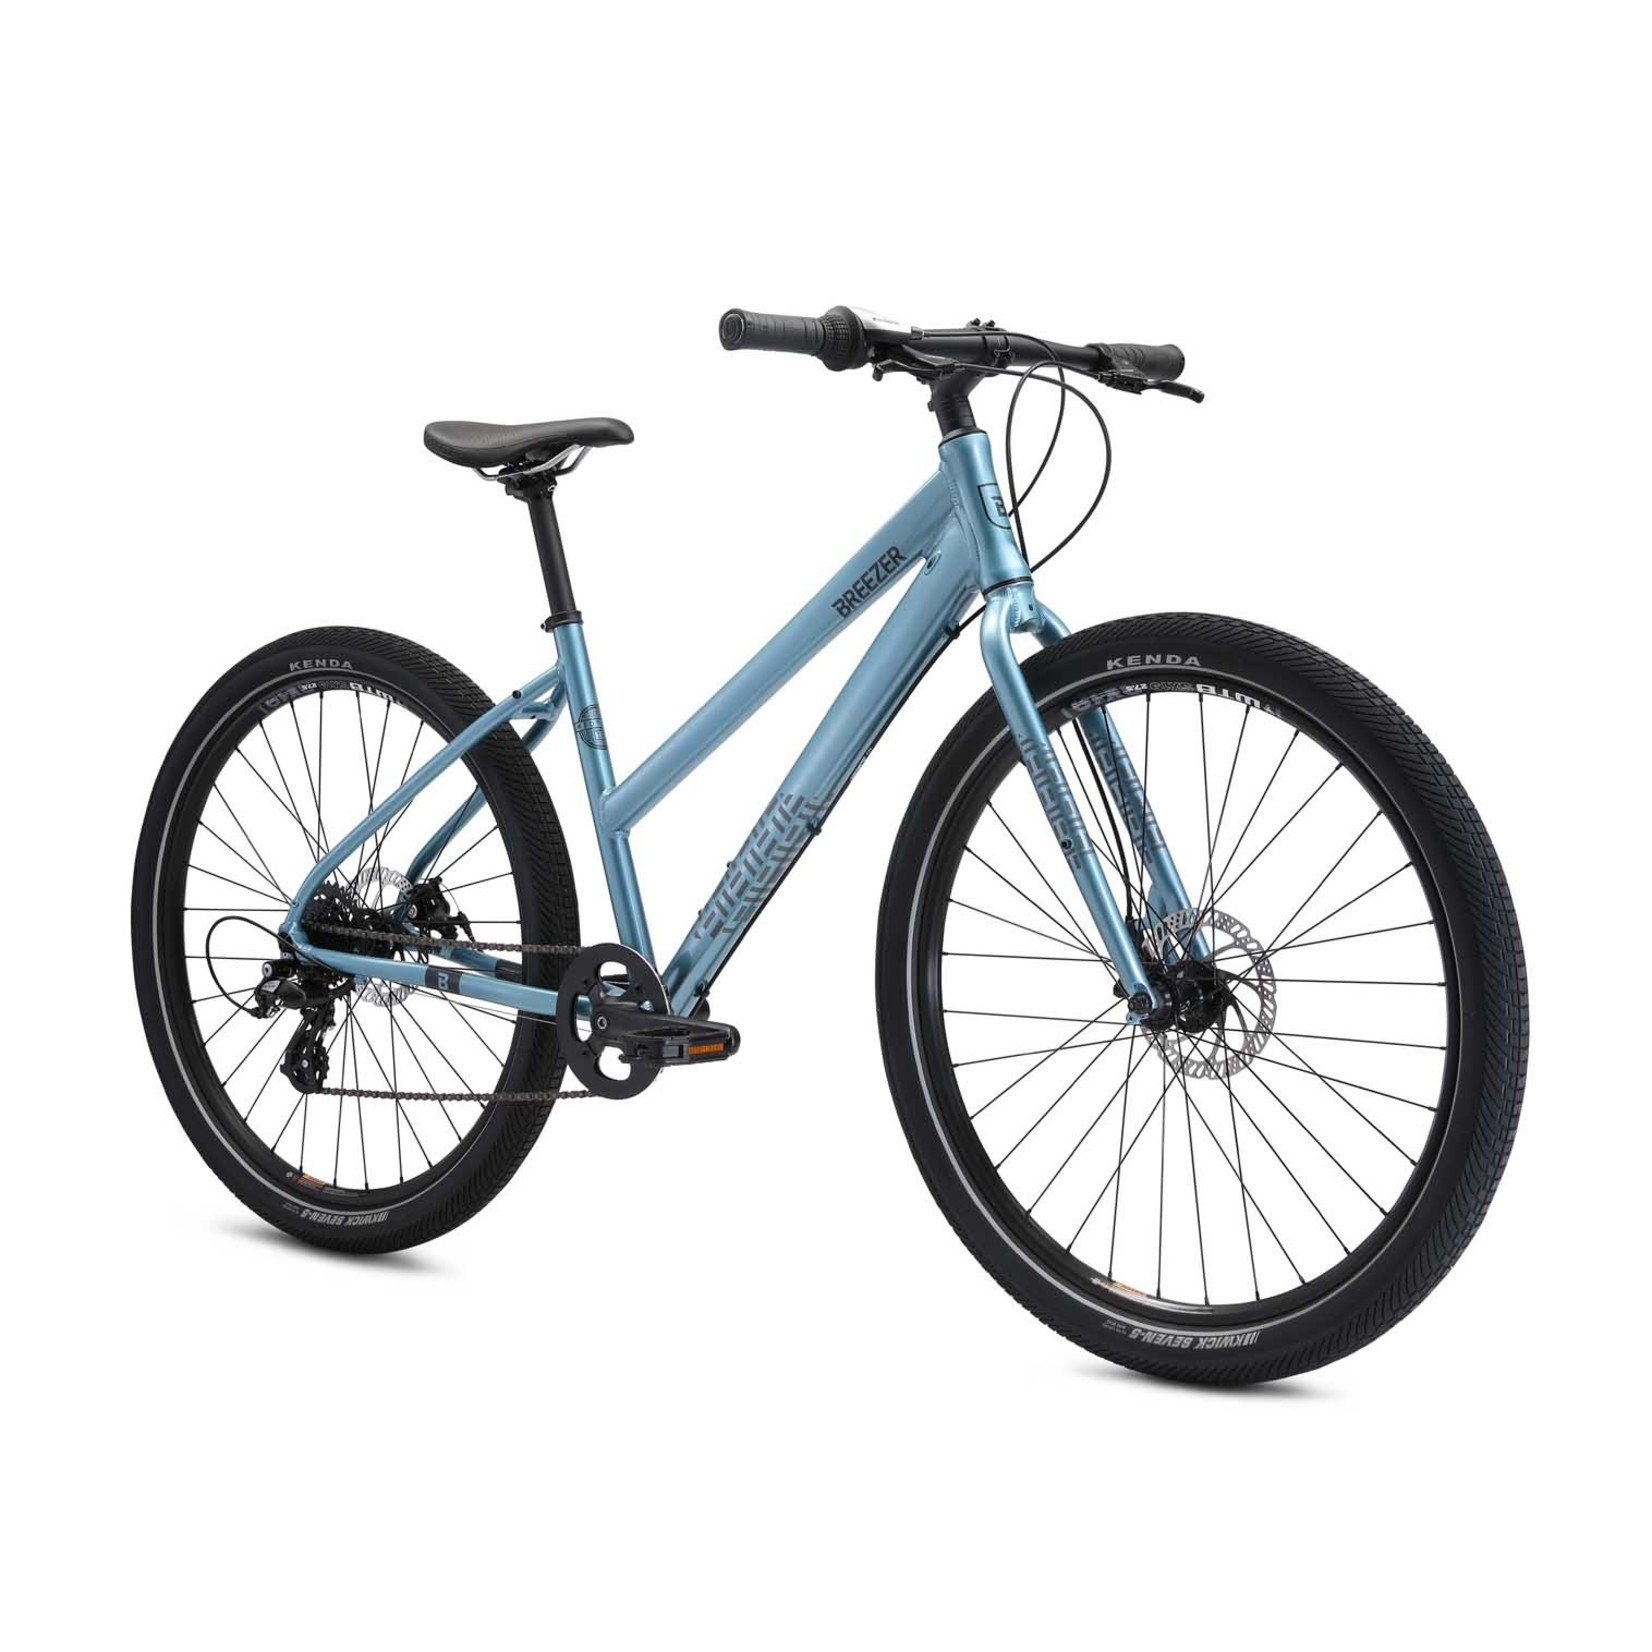 Breezer Bikes Breezer Midtown 1.7 ST